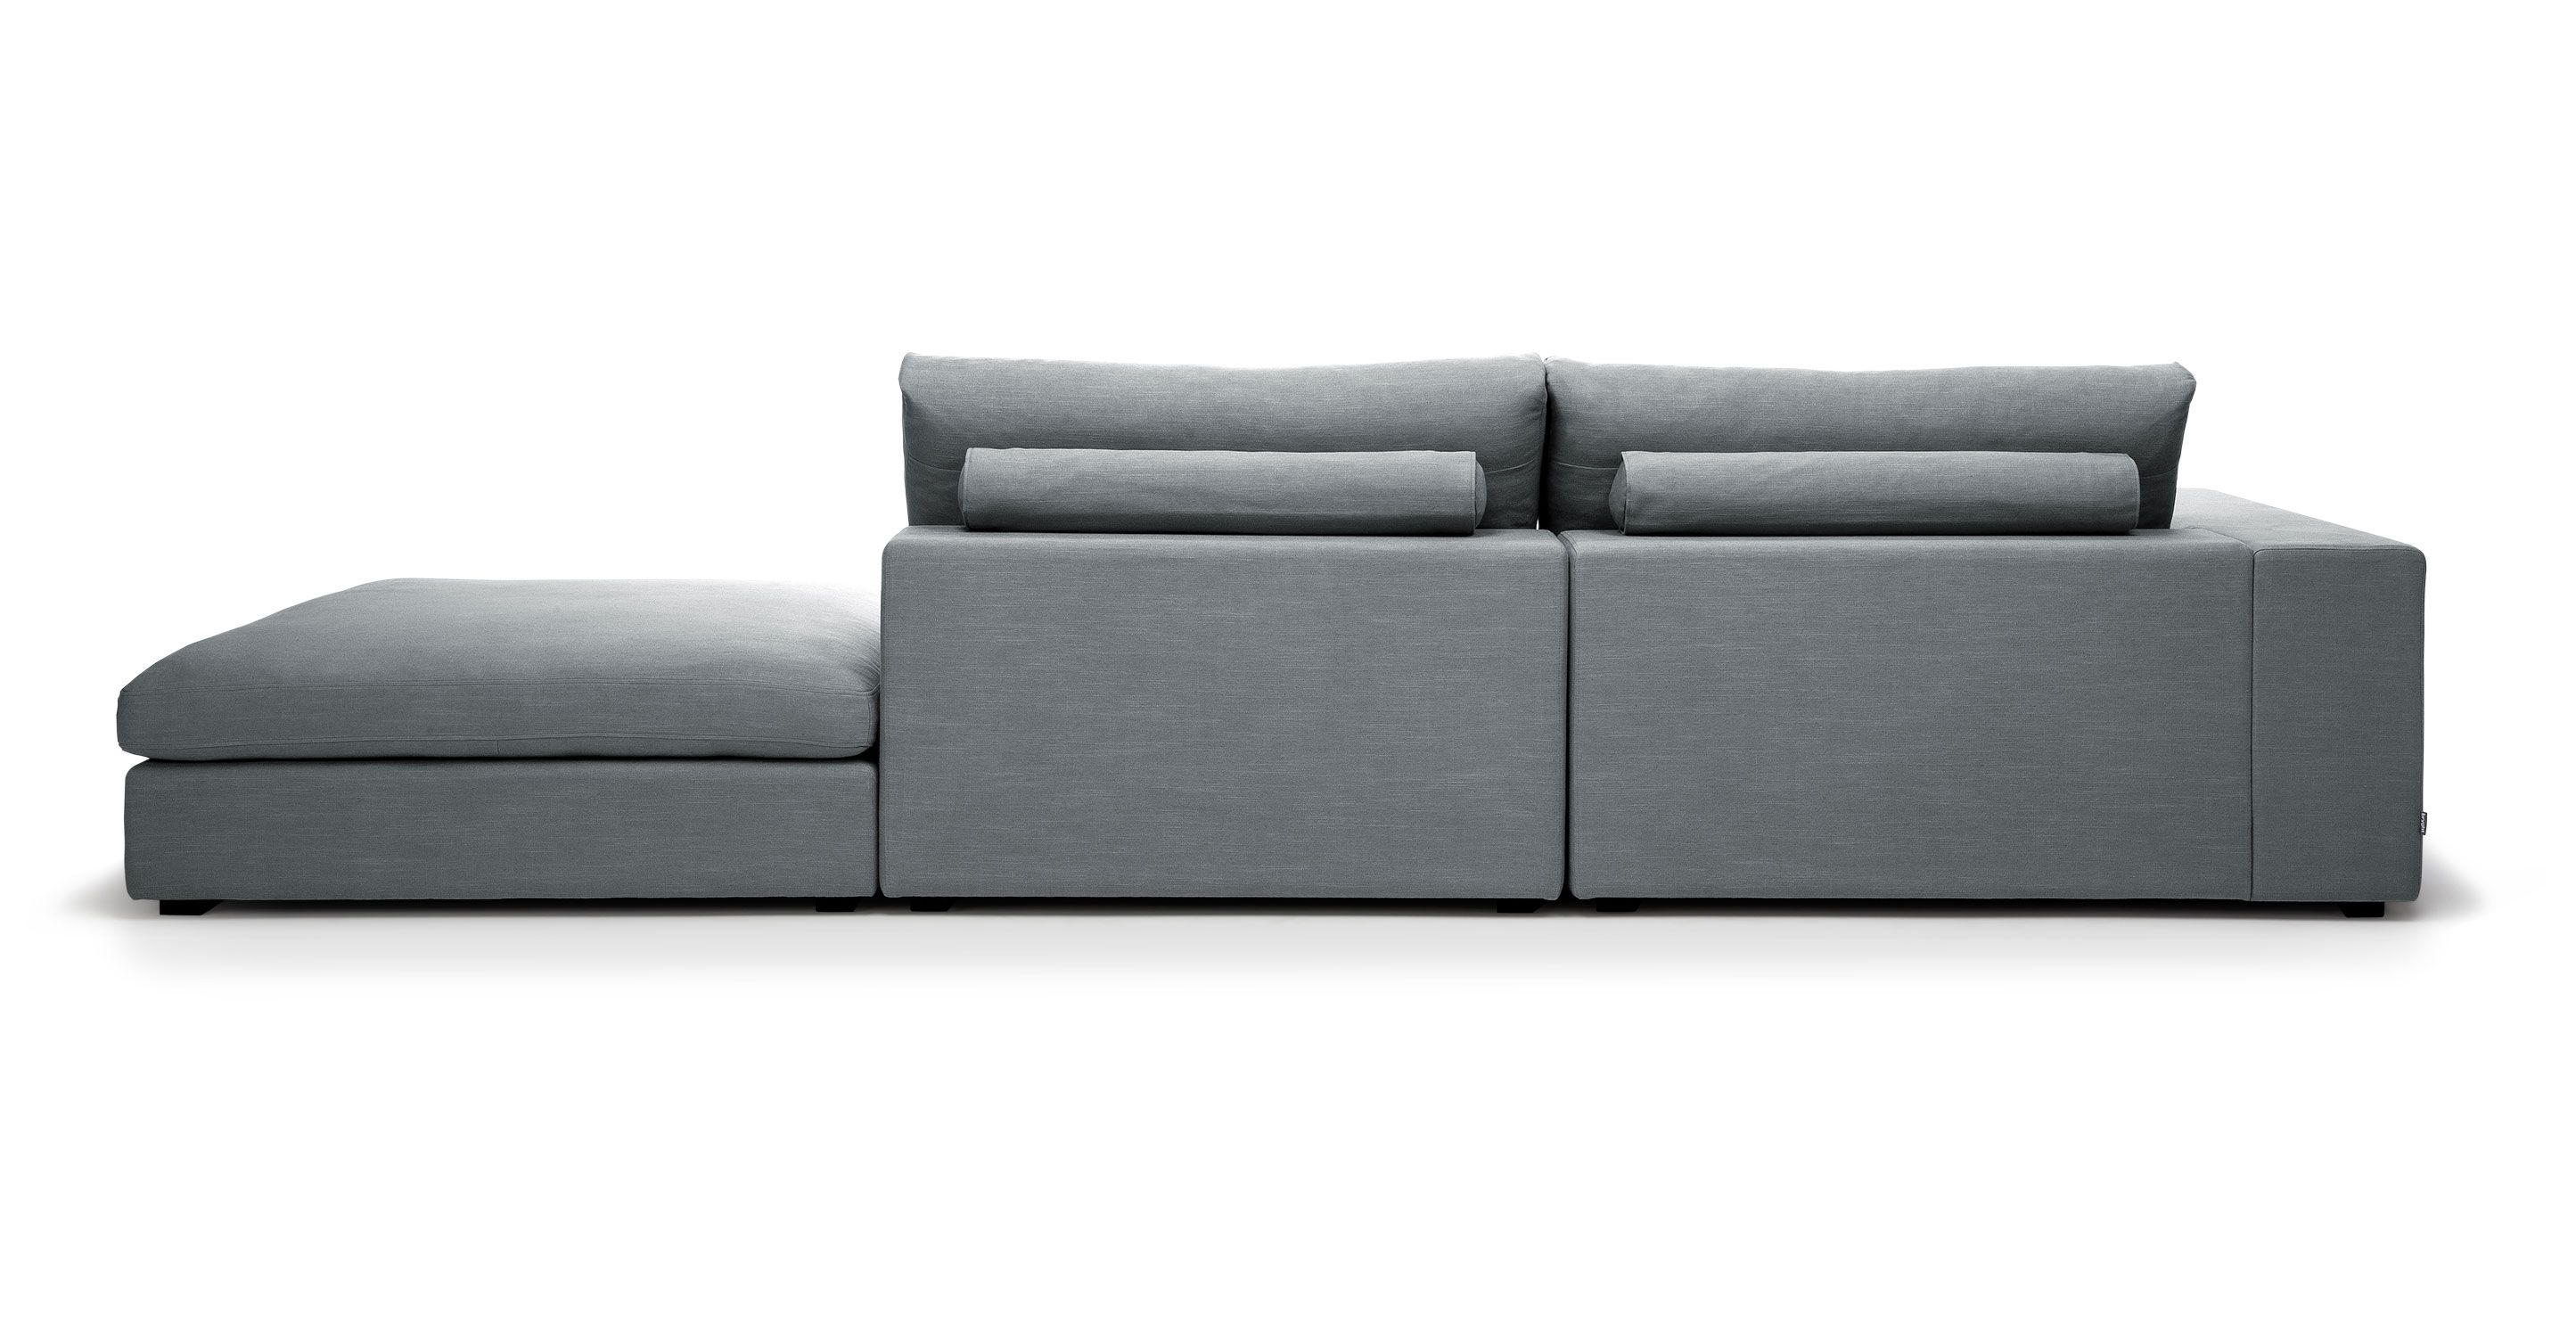 Gray Contemporary Sofa Cube Contemporary Furniture